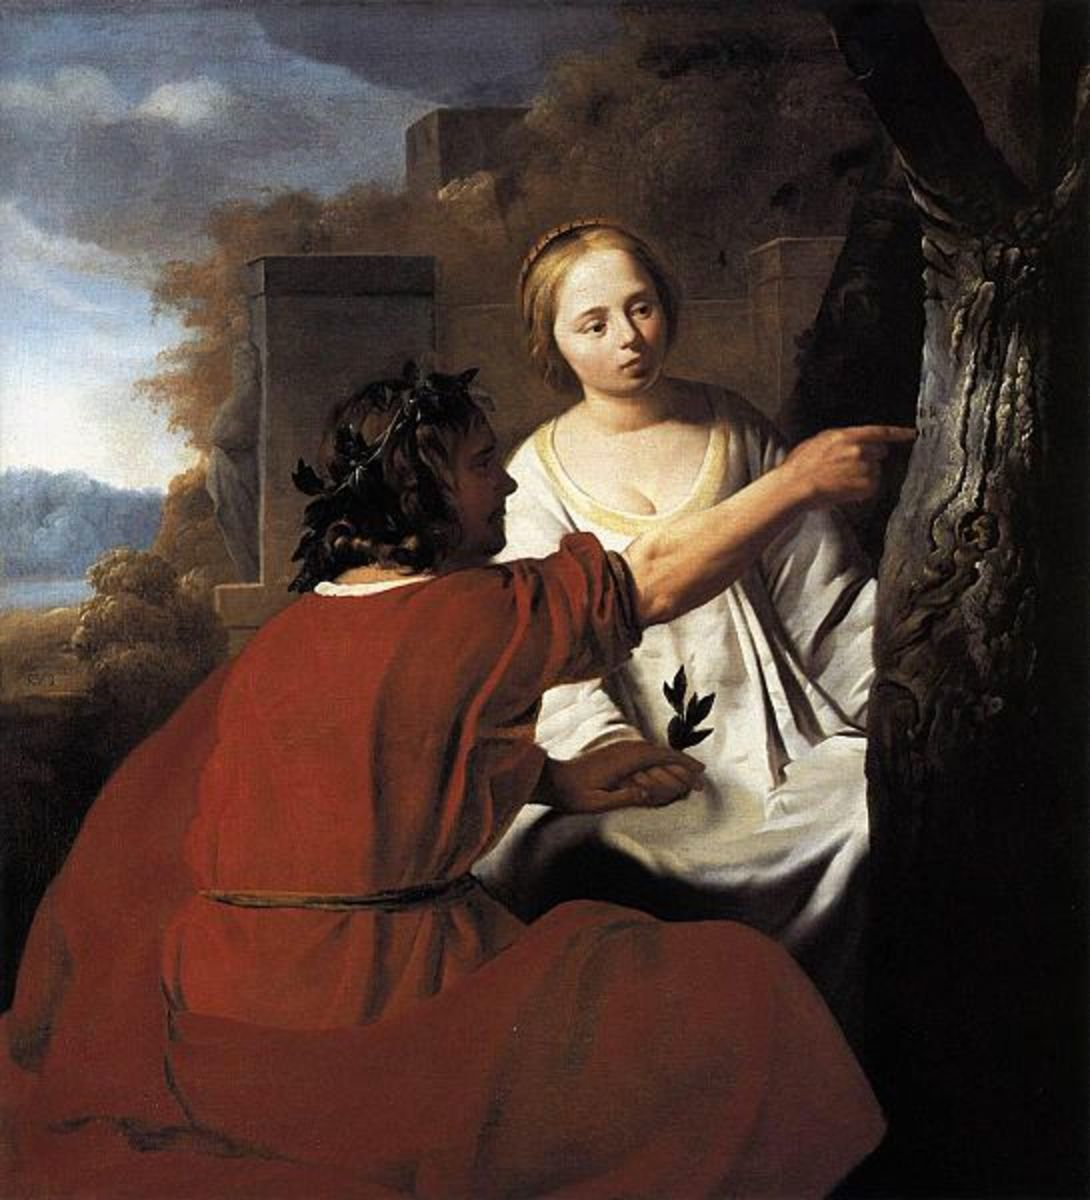 Paris and Oenone - Reyer Jacobsz. van Blommendael (1628–1675) - PD-art-100